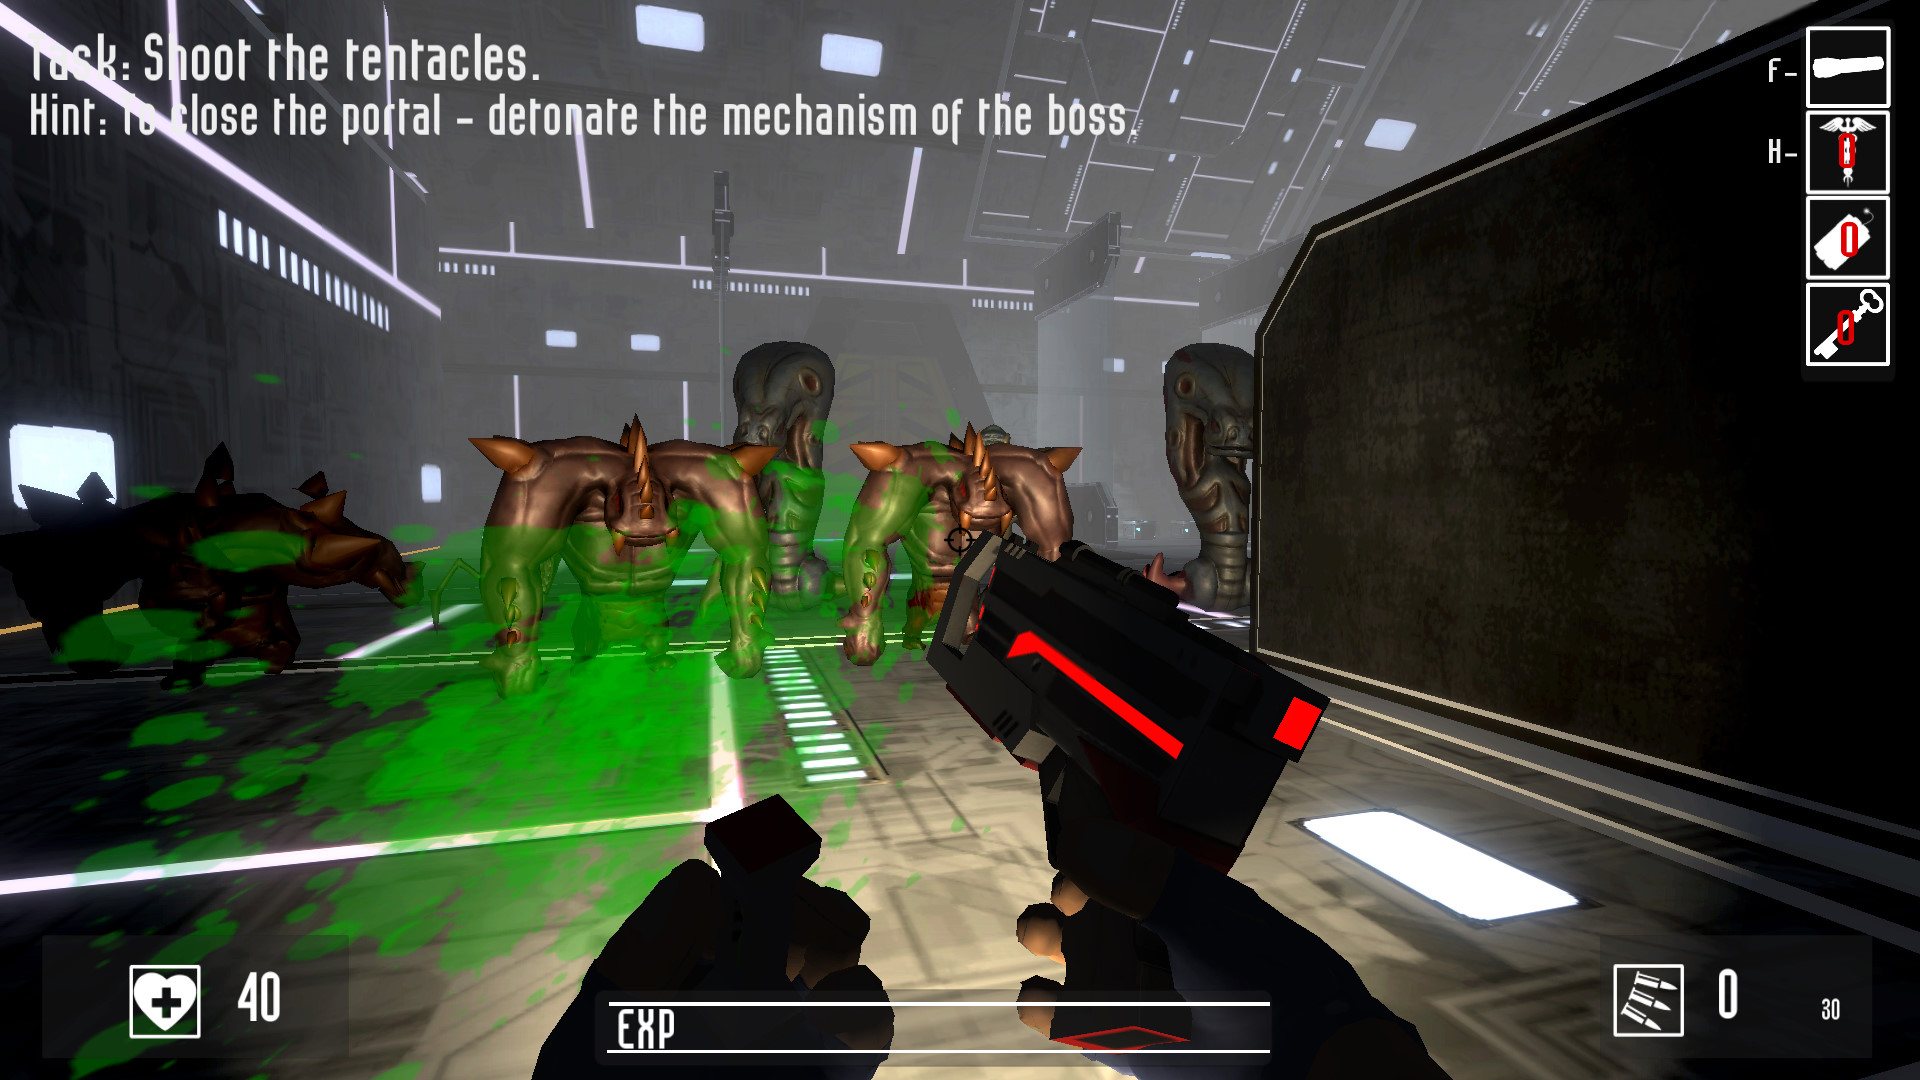 The guard of dungeon screenshot